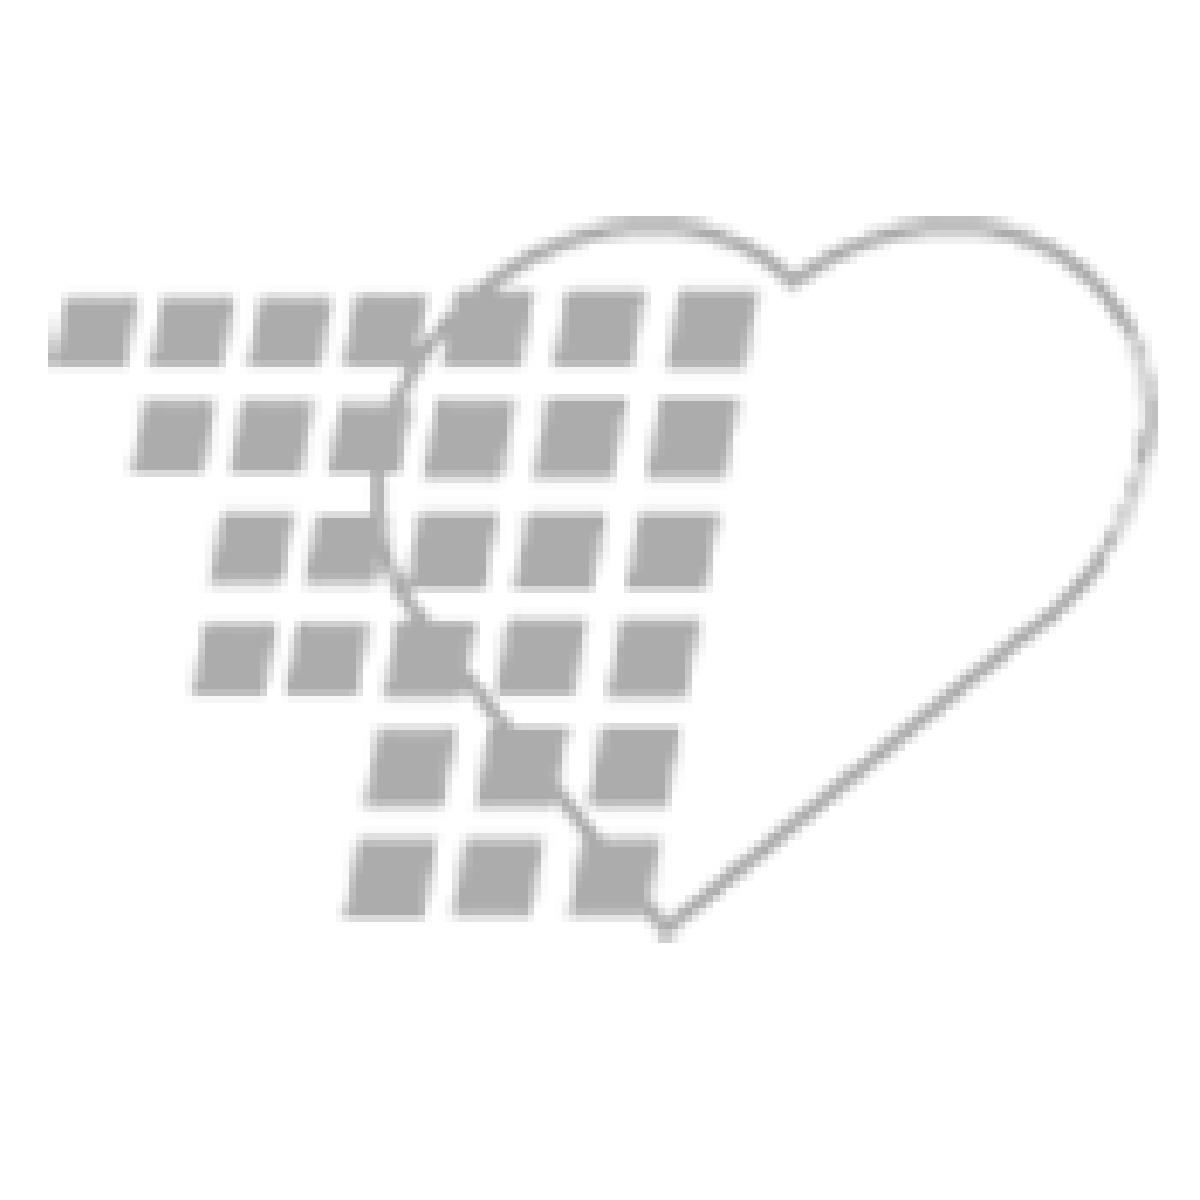 05-46-6114 Salem Sump™ Dual Lumen Stomach Tube with Anti-Reflux Valve - 12 Fr